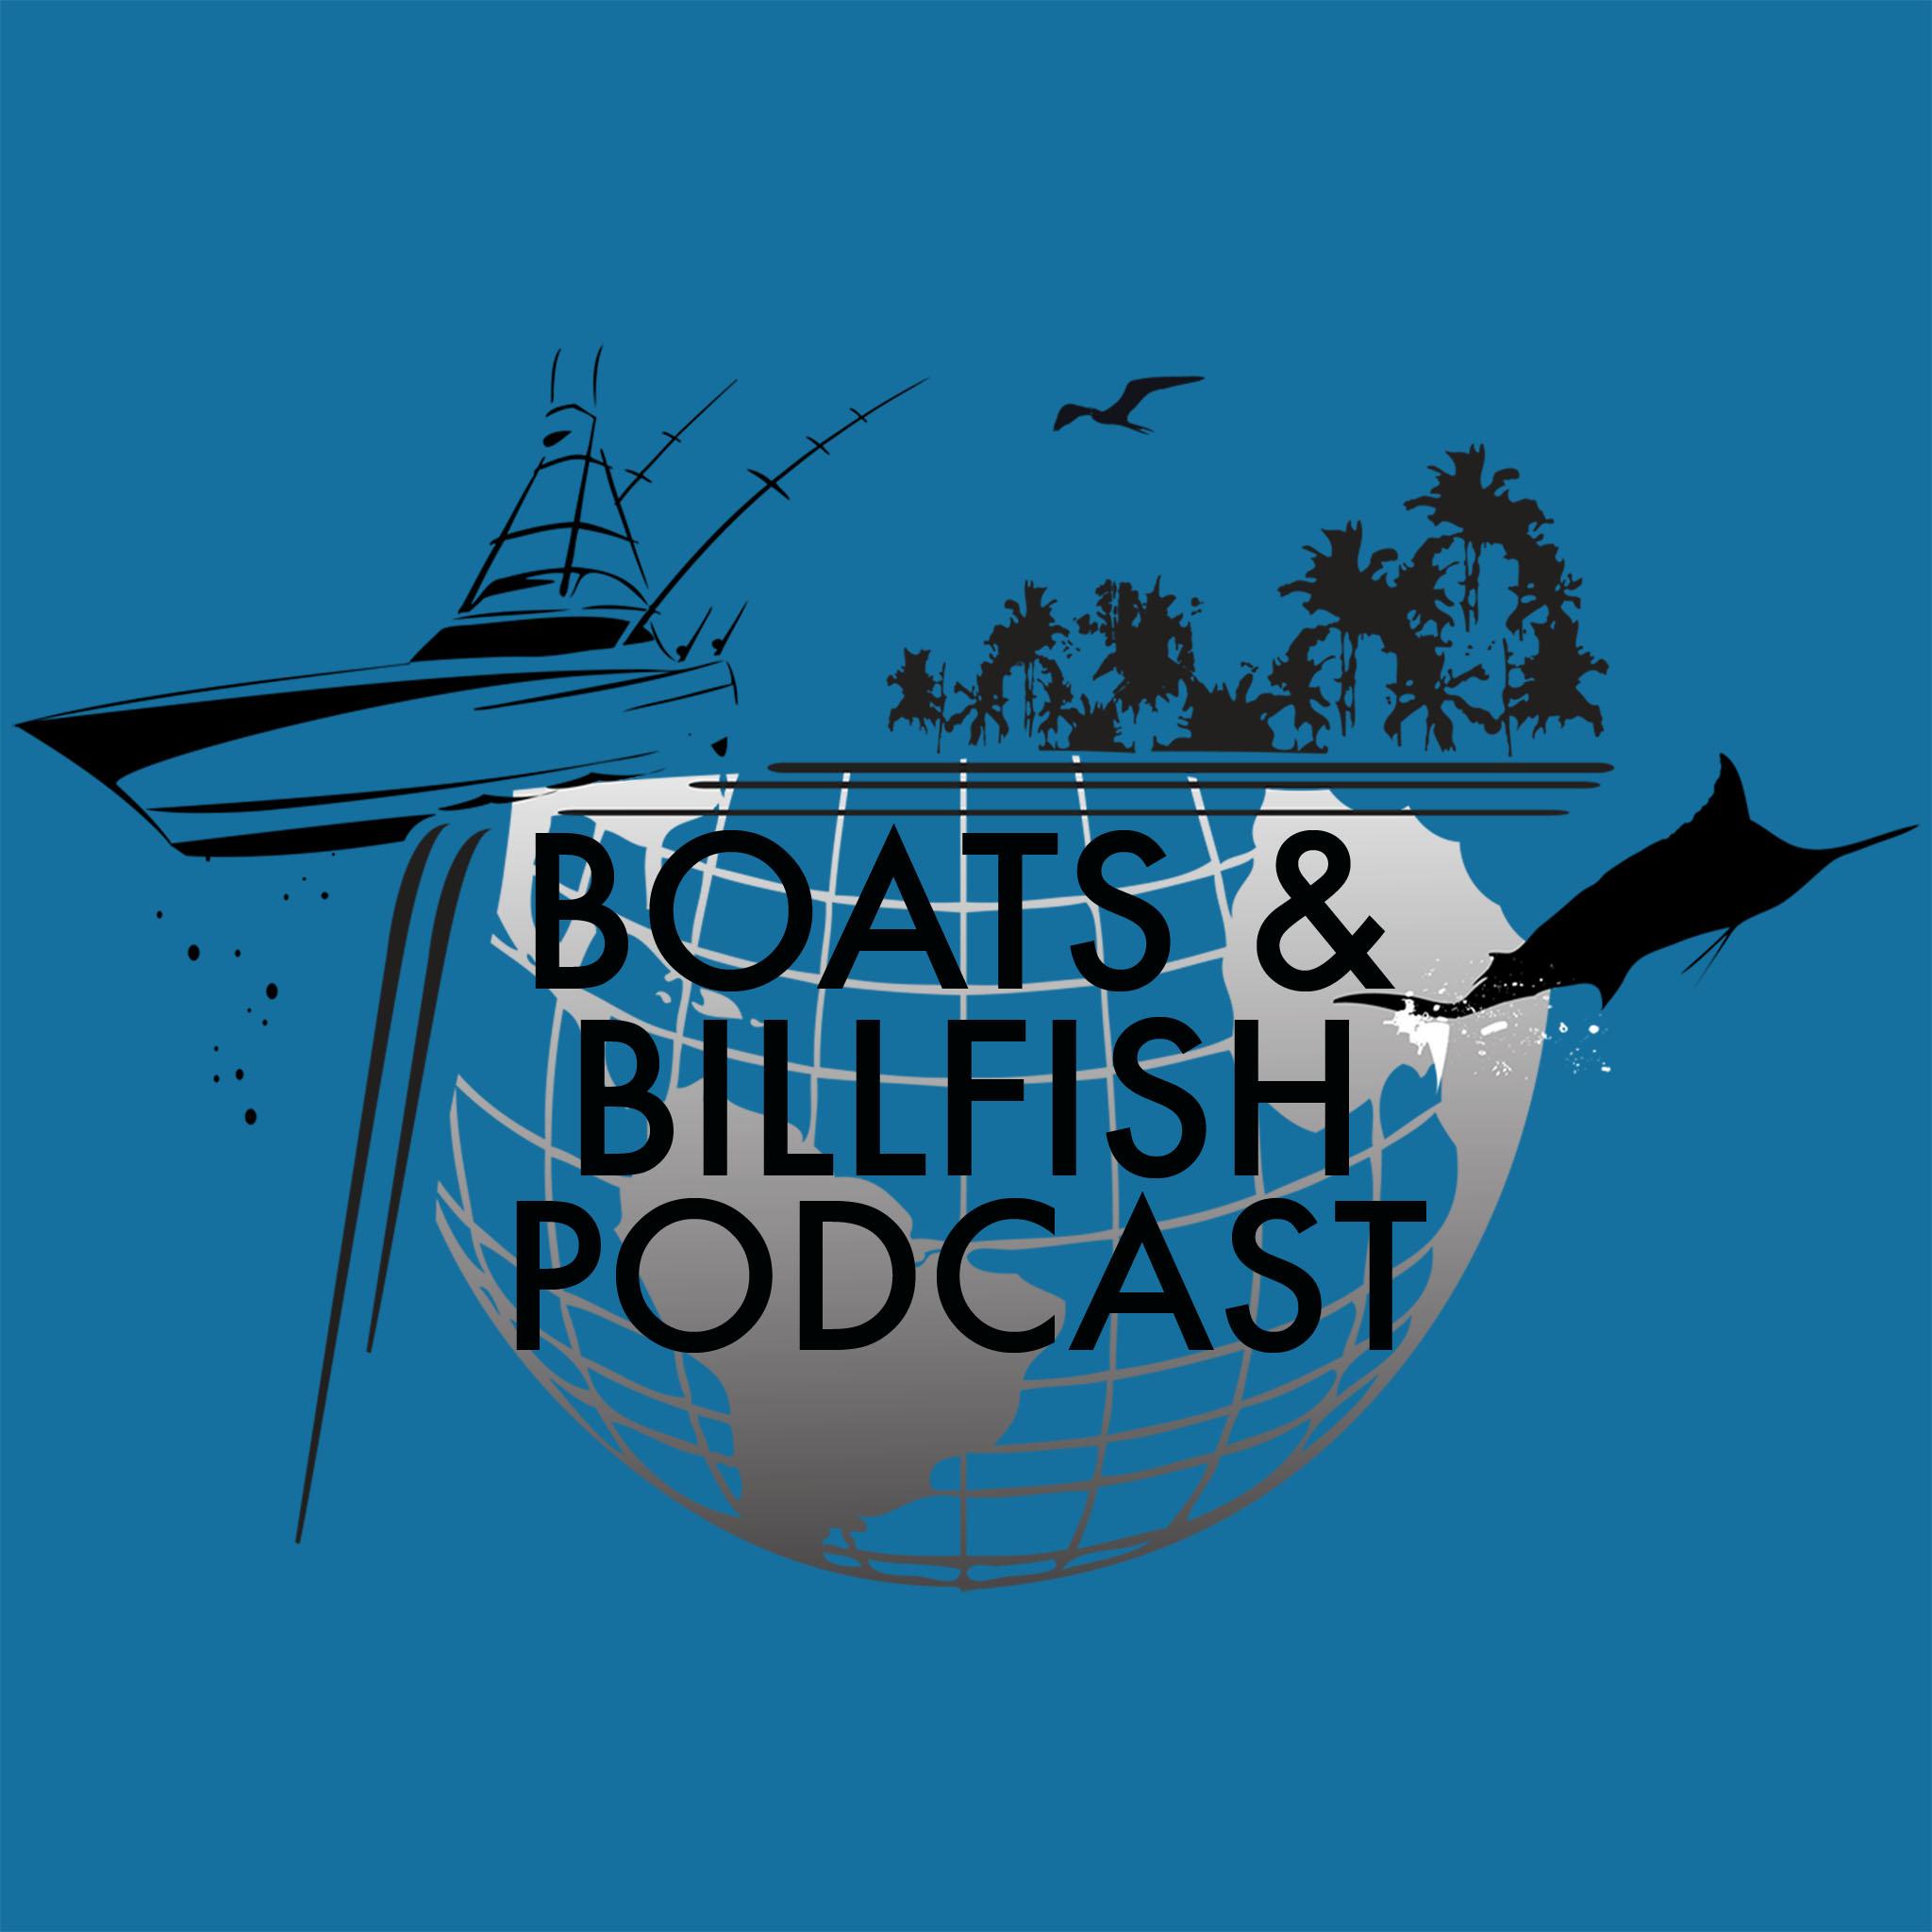 Boats & Billfish